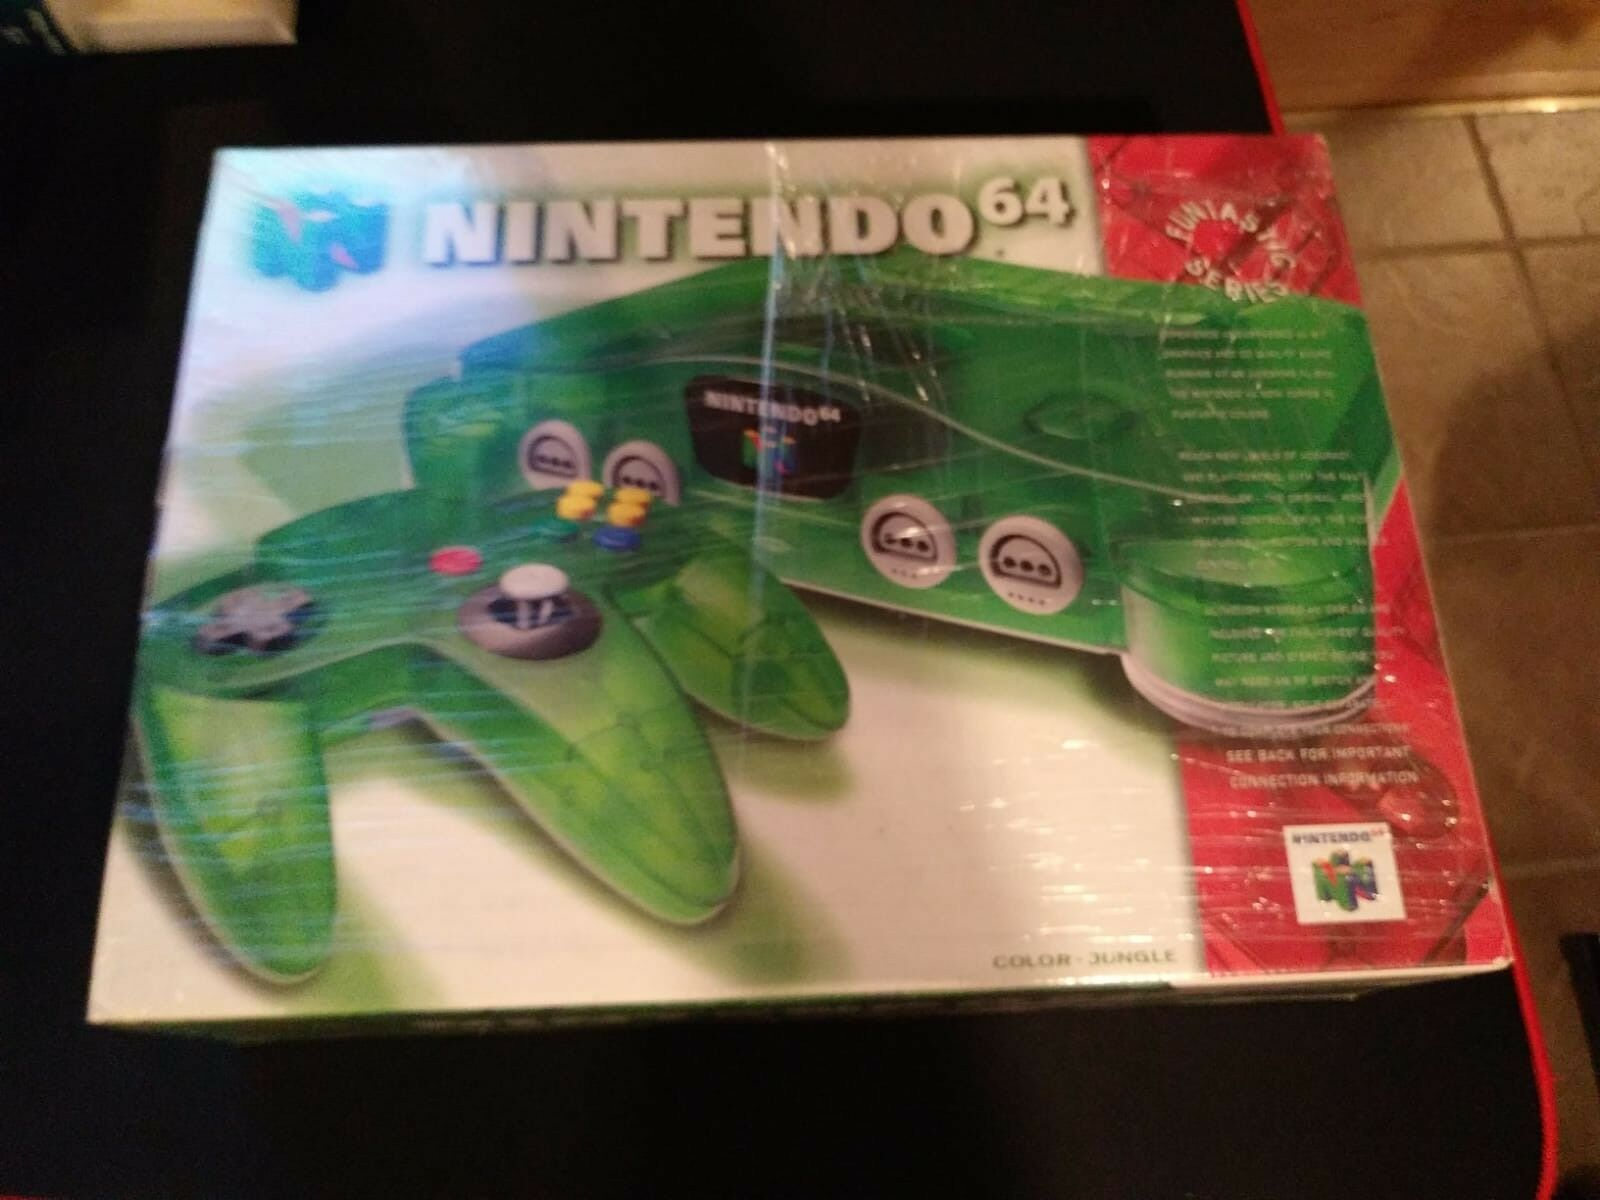 Nintendo 64 Launch Edition Console - Jungle Green